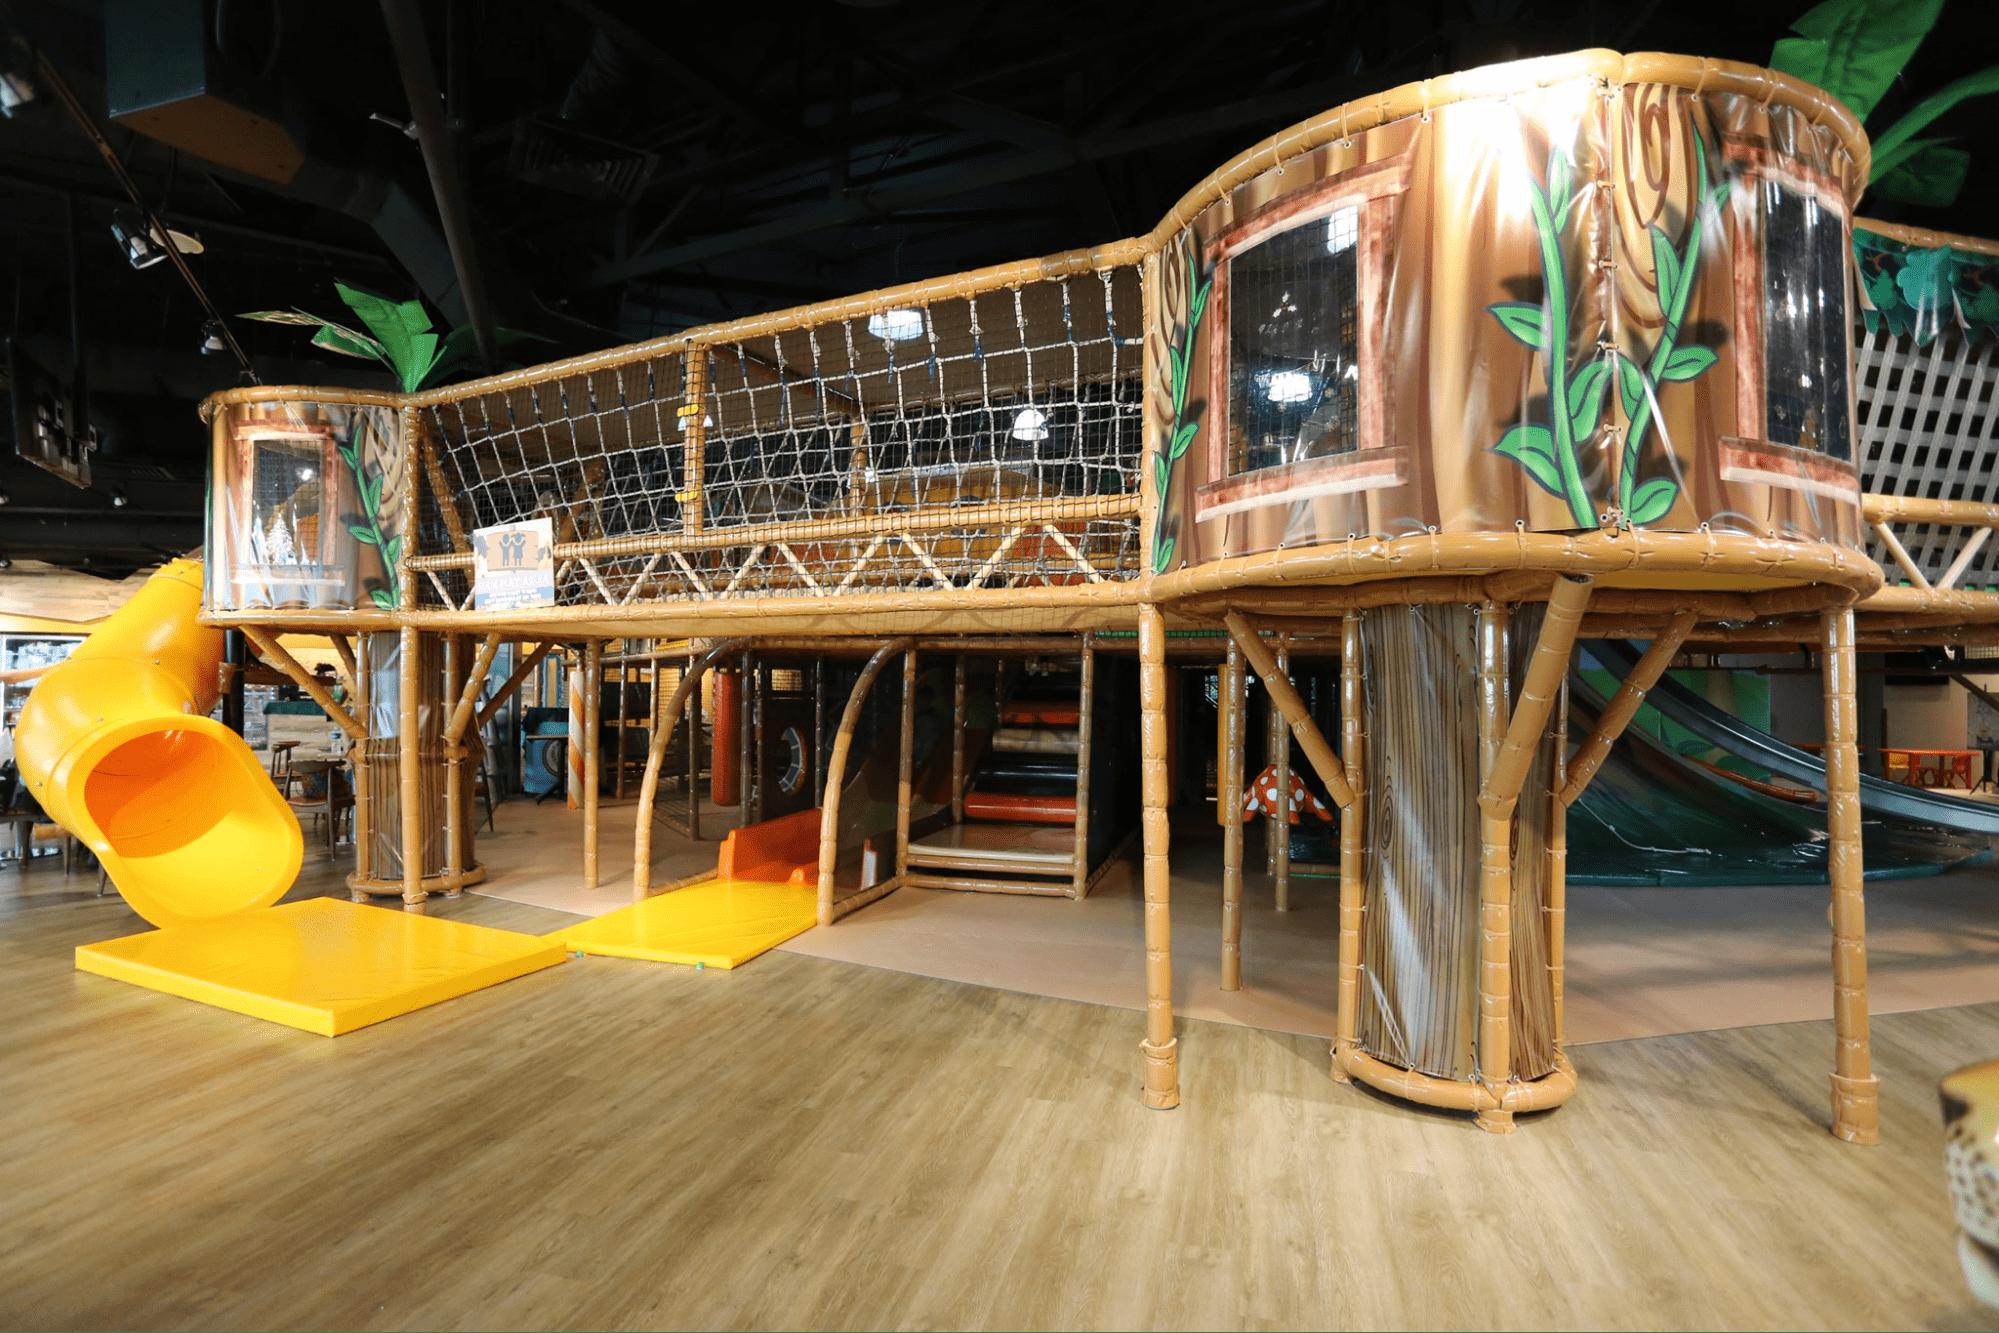 Waka Waka Safari-themed indoor playground at Furama riverfront